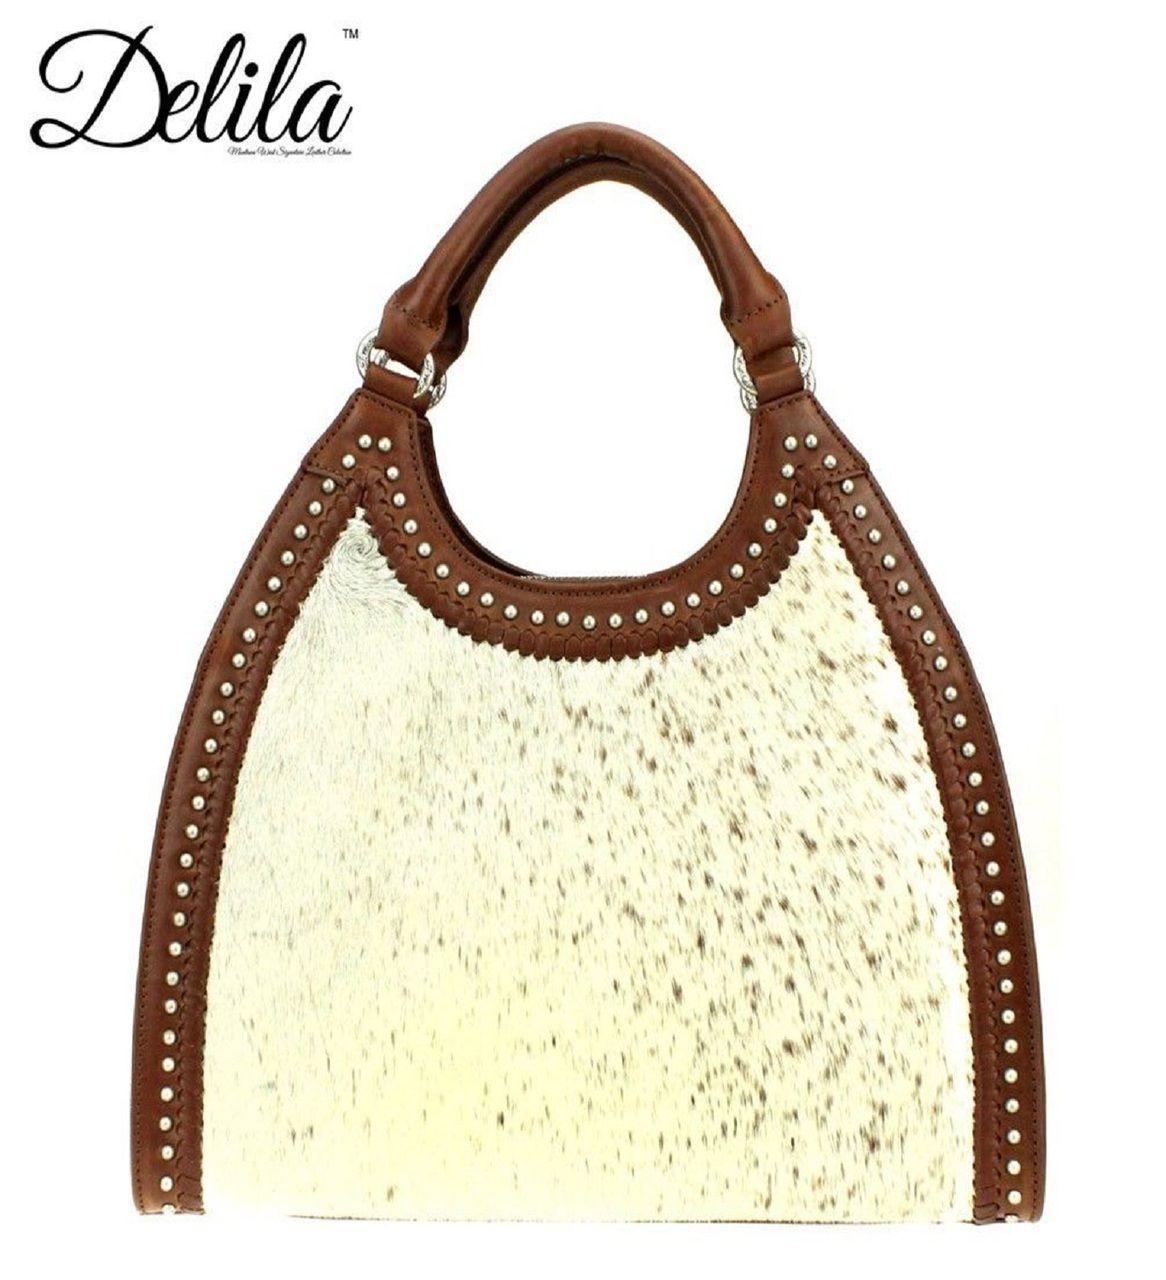 DELILA Genuine Leather Hair-On Hide Collection Handbag